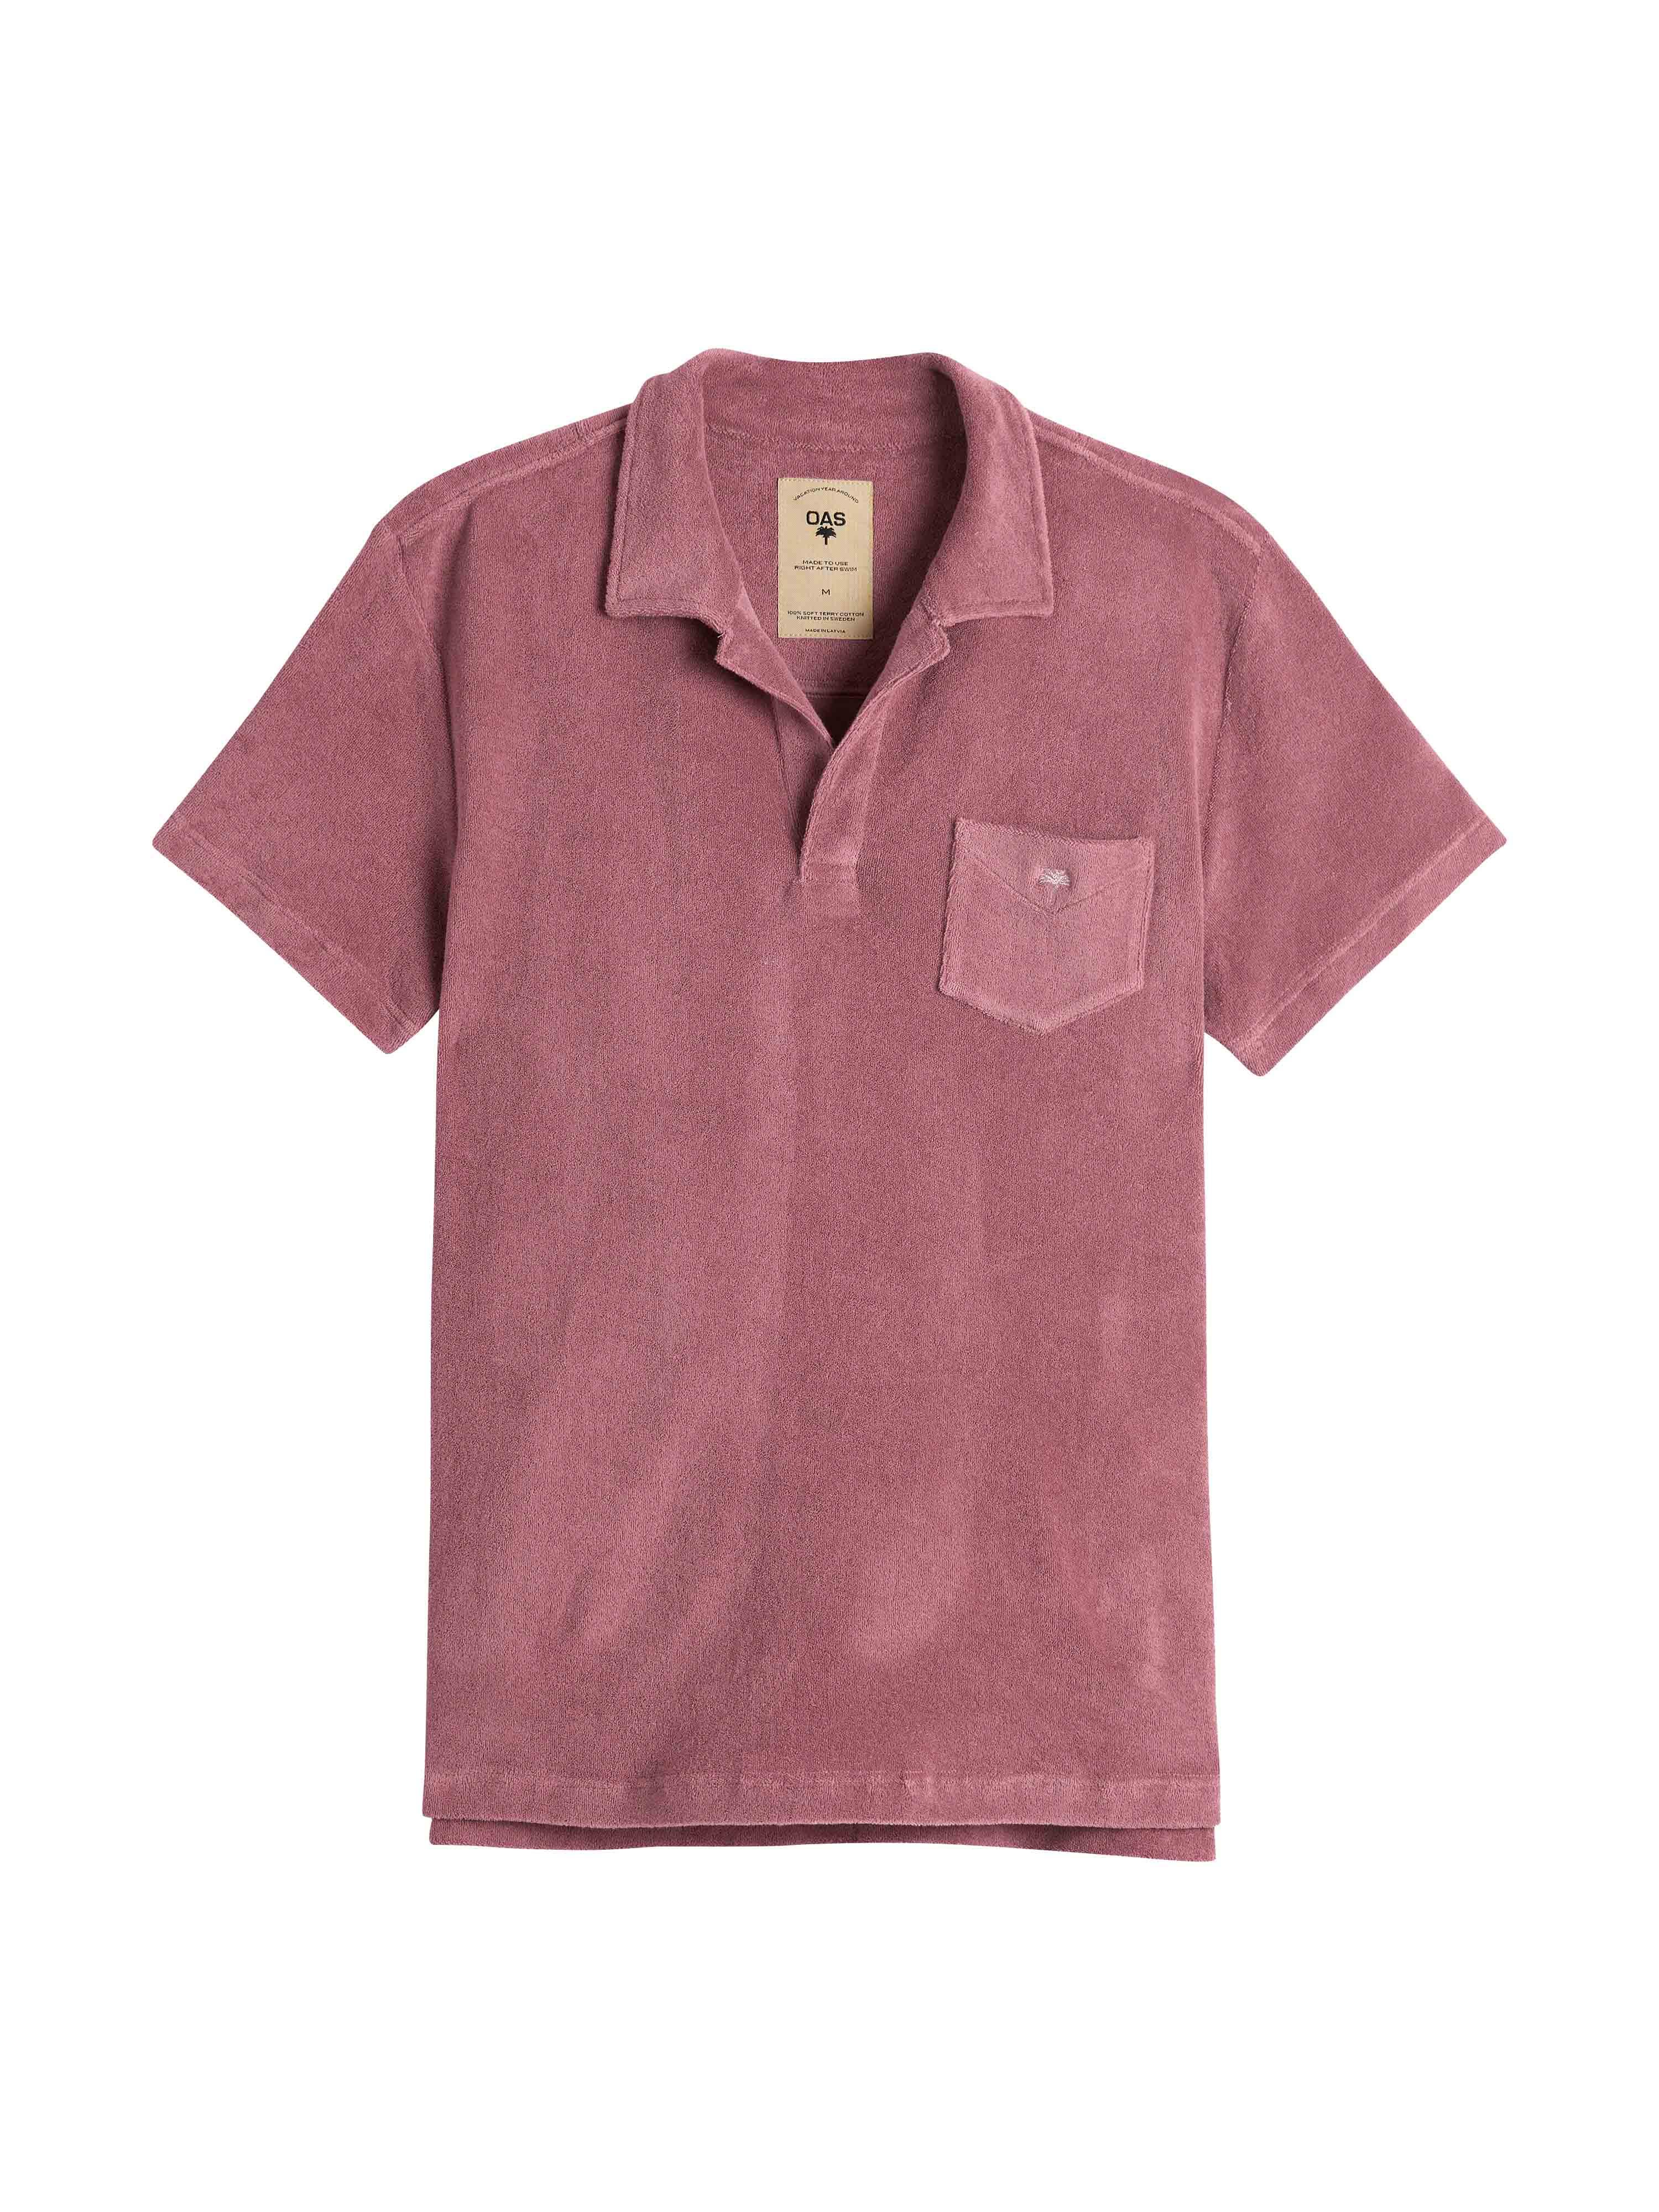 Dusty Plum Terry Shirt